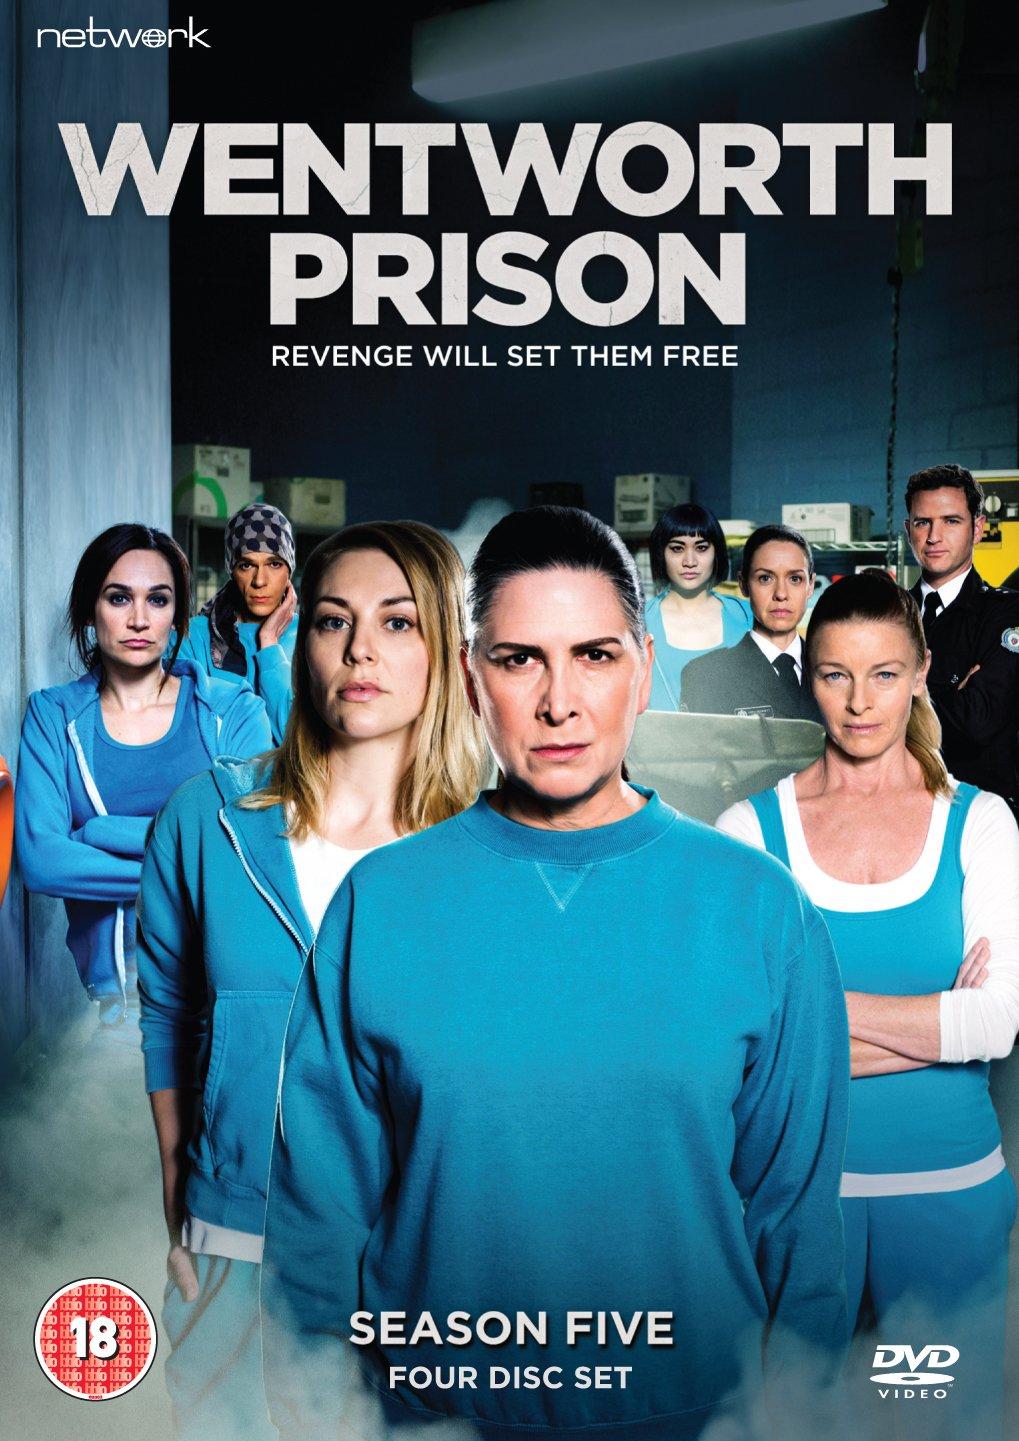 Wentworth Prison: Season 5